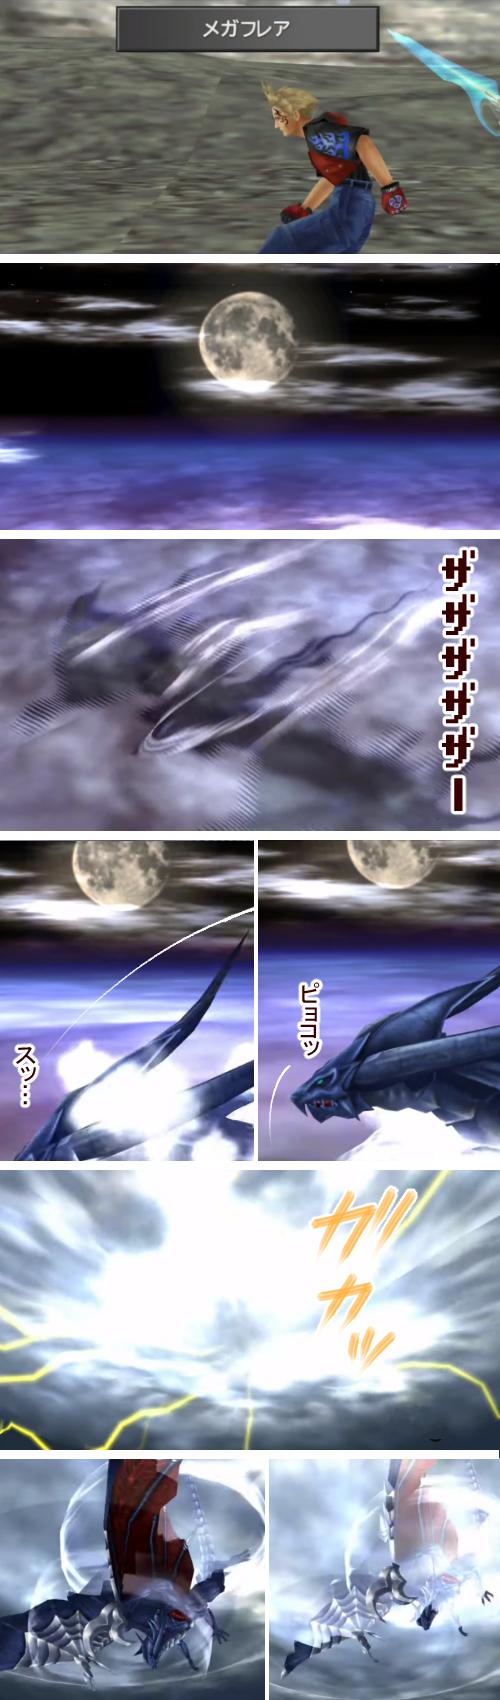 FF8G.F.「バハムート」召喚シーン1